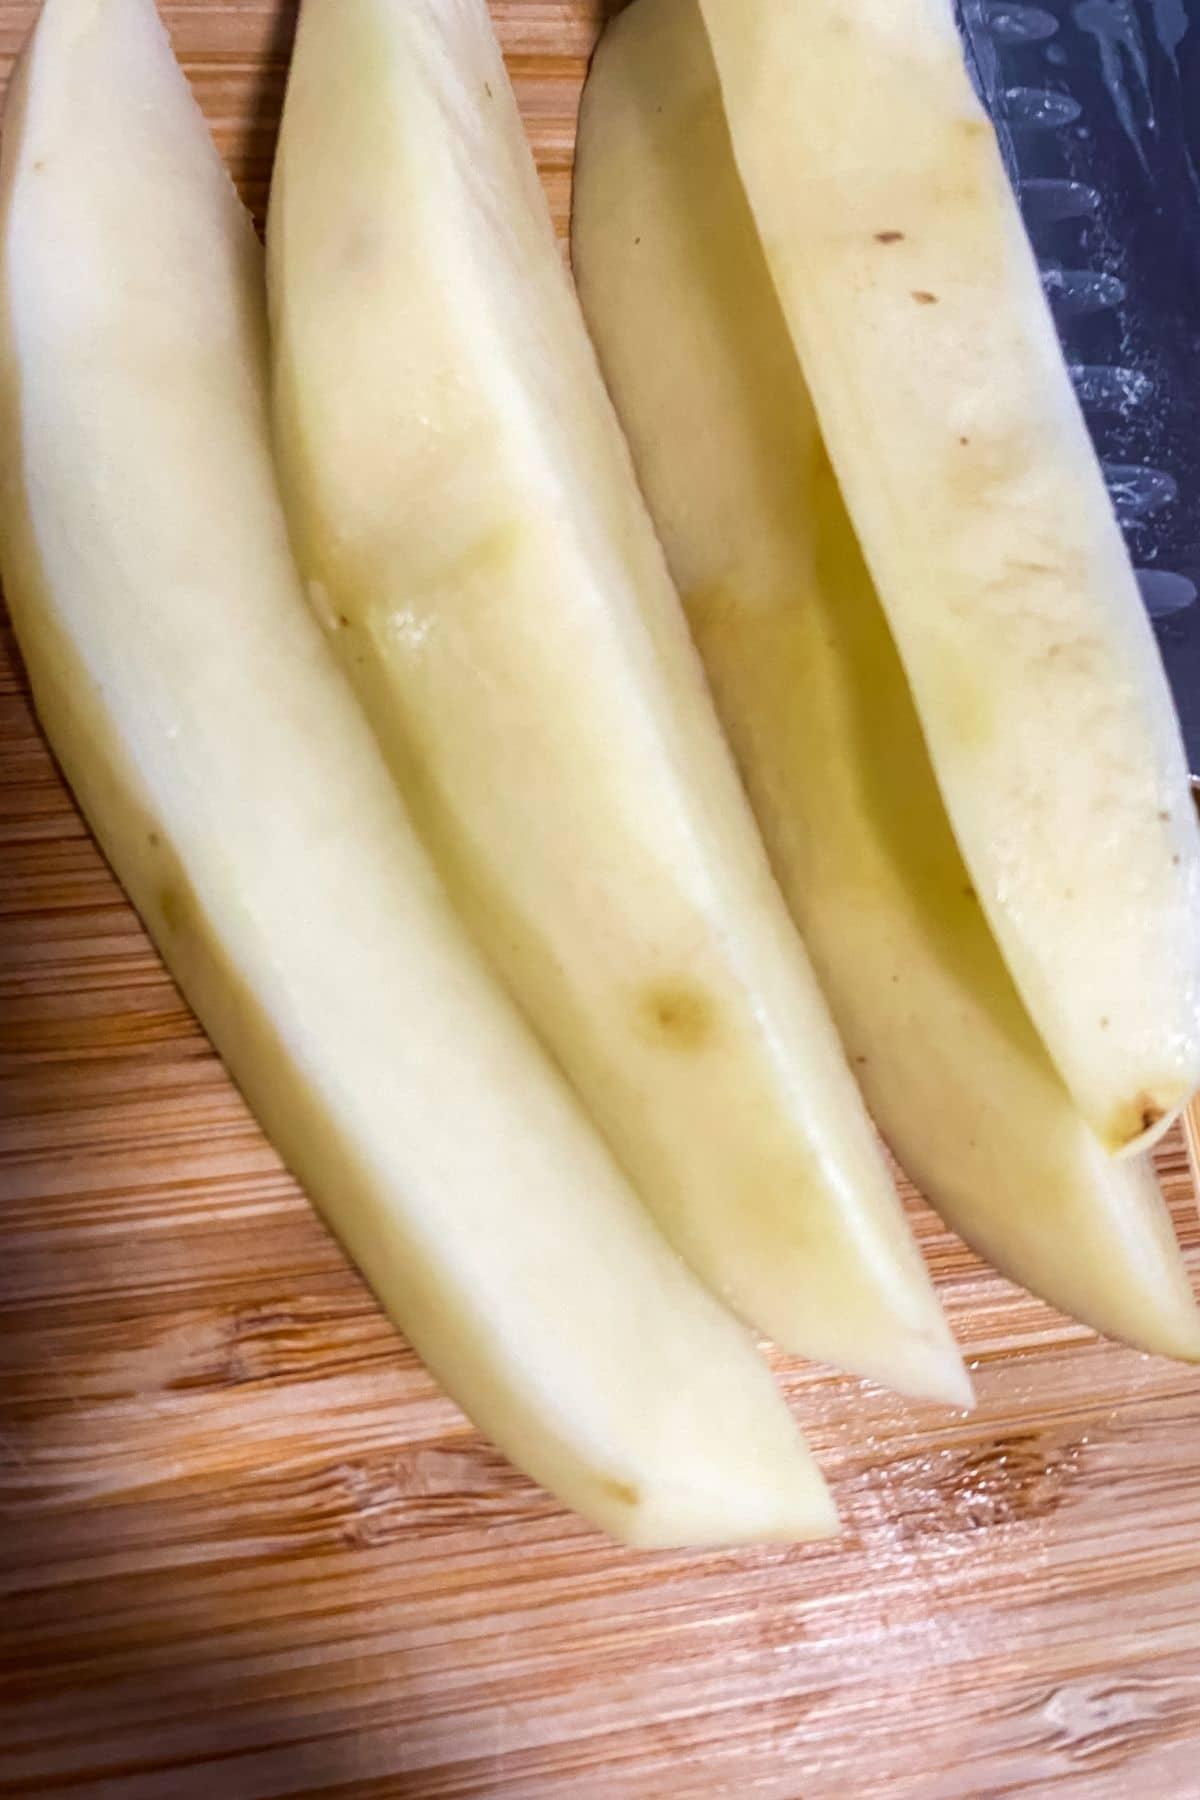 Peeled sliced potatoes on cutting board